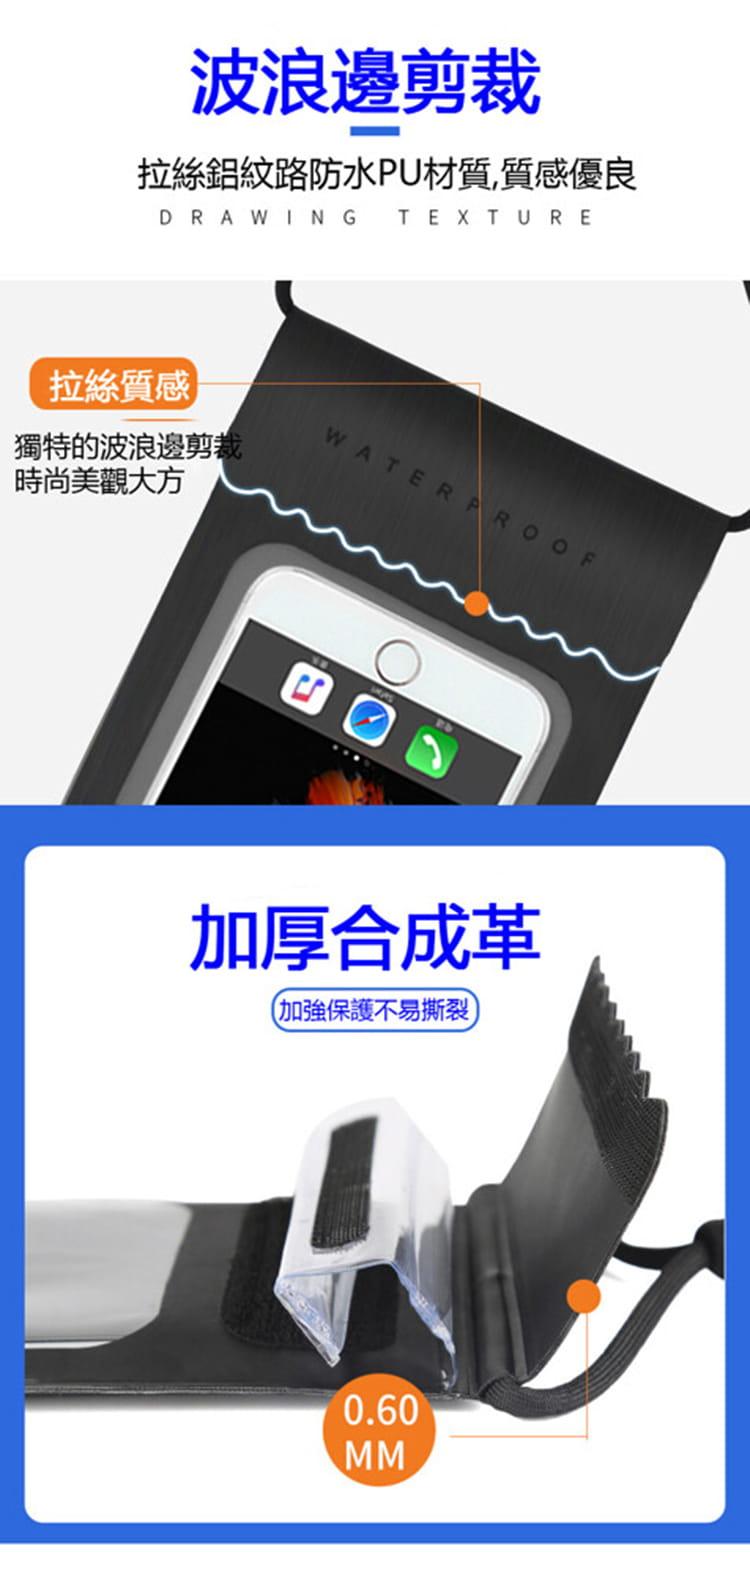 【JAR嚴選】IPX8 多功能運動潛水海灘耐磨防水手機袋 7